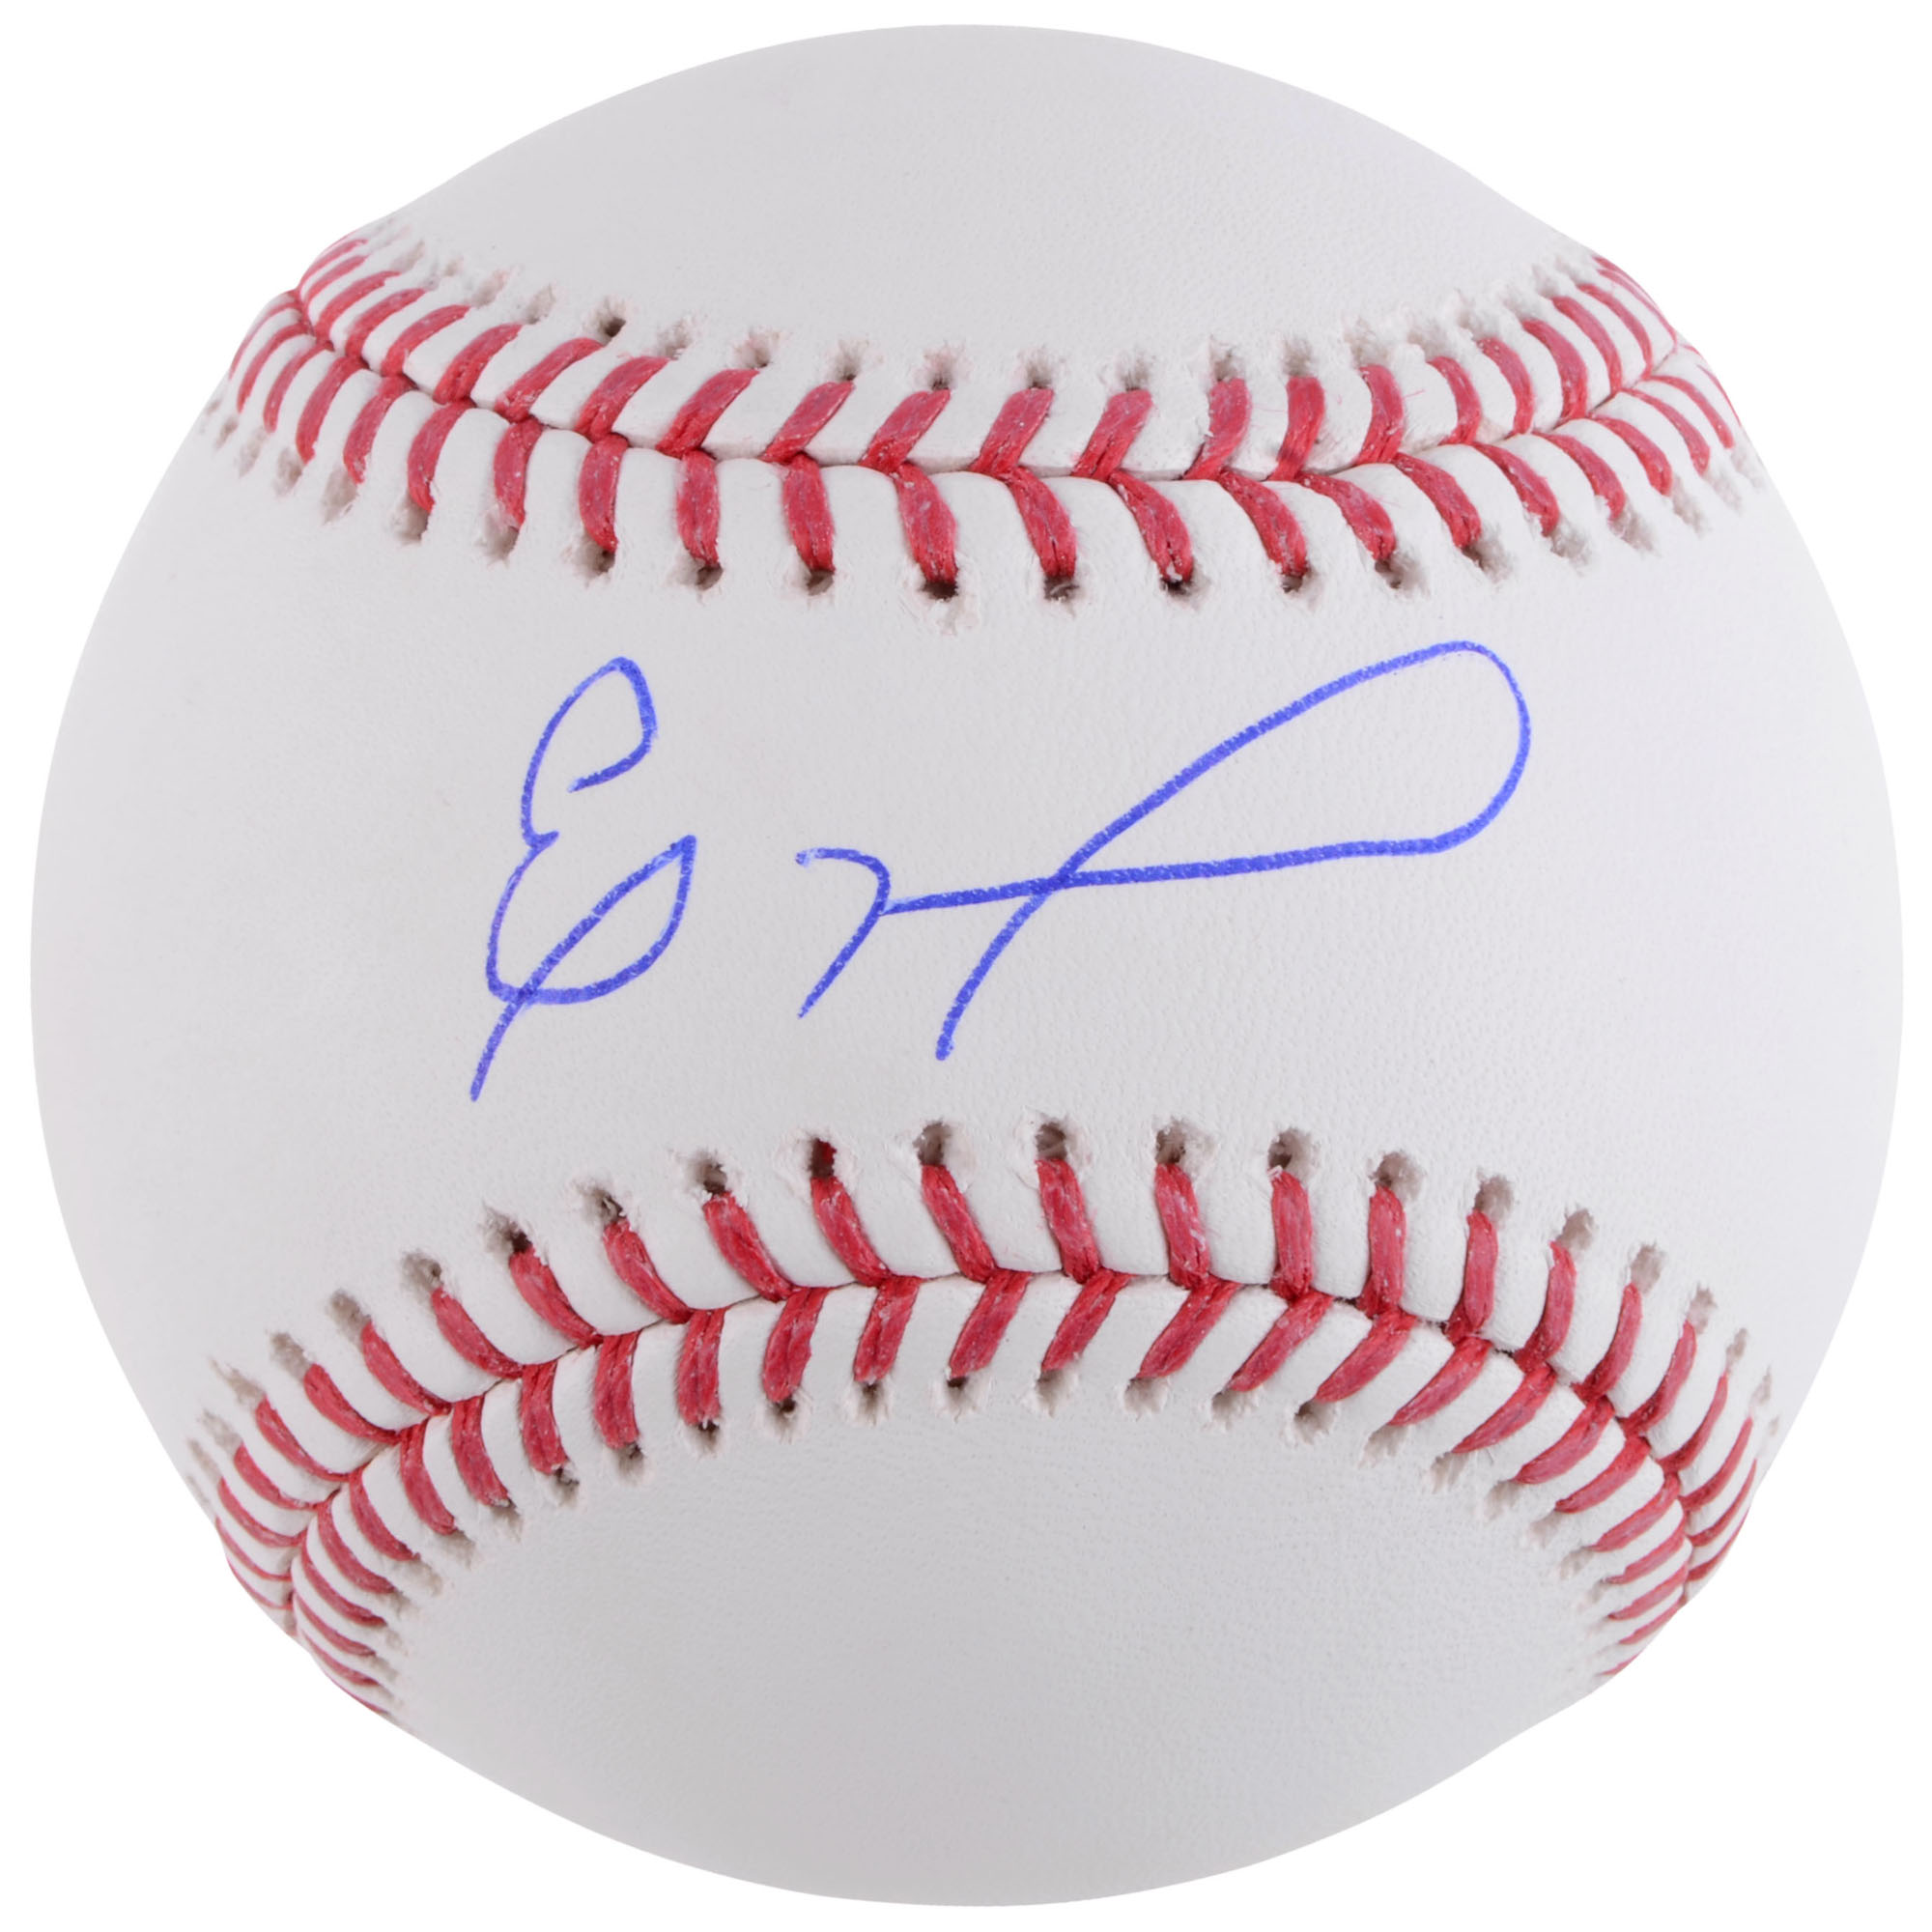 Eloy Jimenez Chicago White Sox Fanatics Authentic Autographed Baseball - No Size